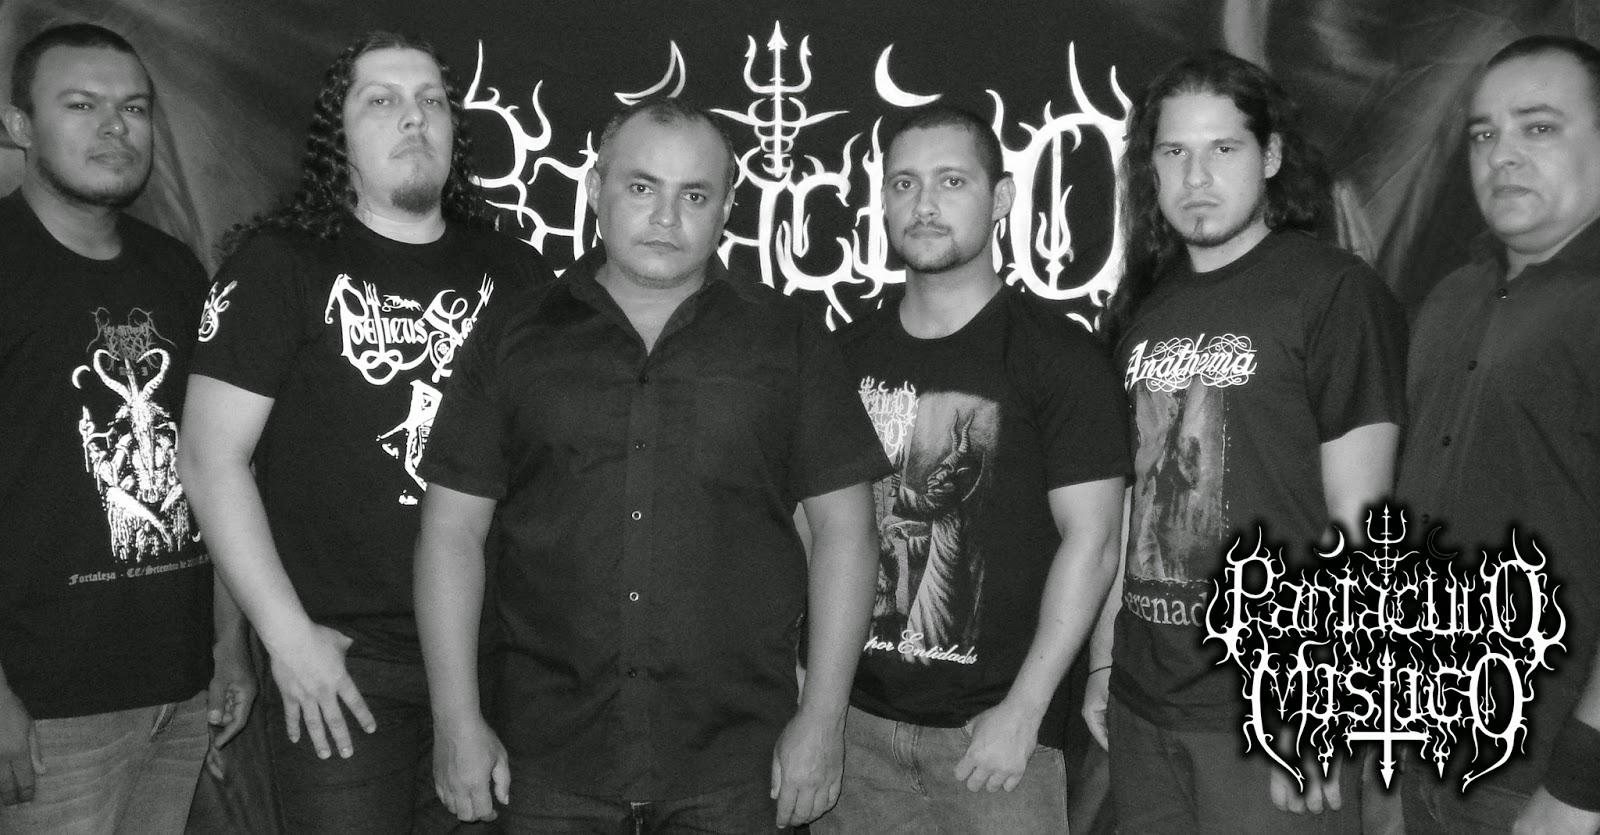 http://questoeseargumentos.blogspot.com.br/2014/10/pantaculo-mistico.html